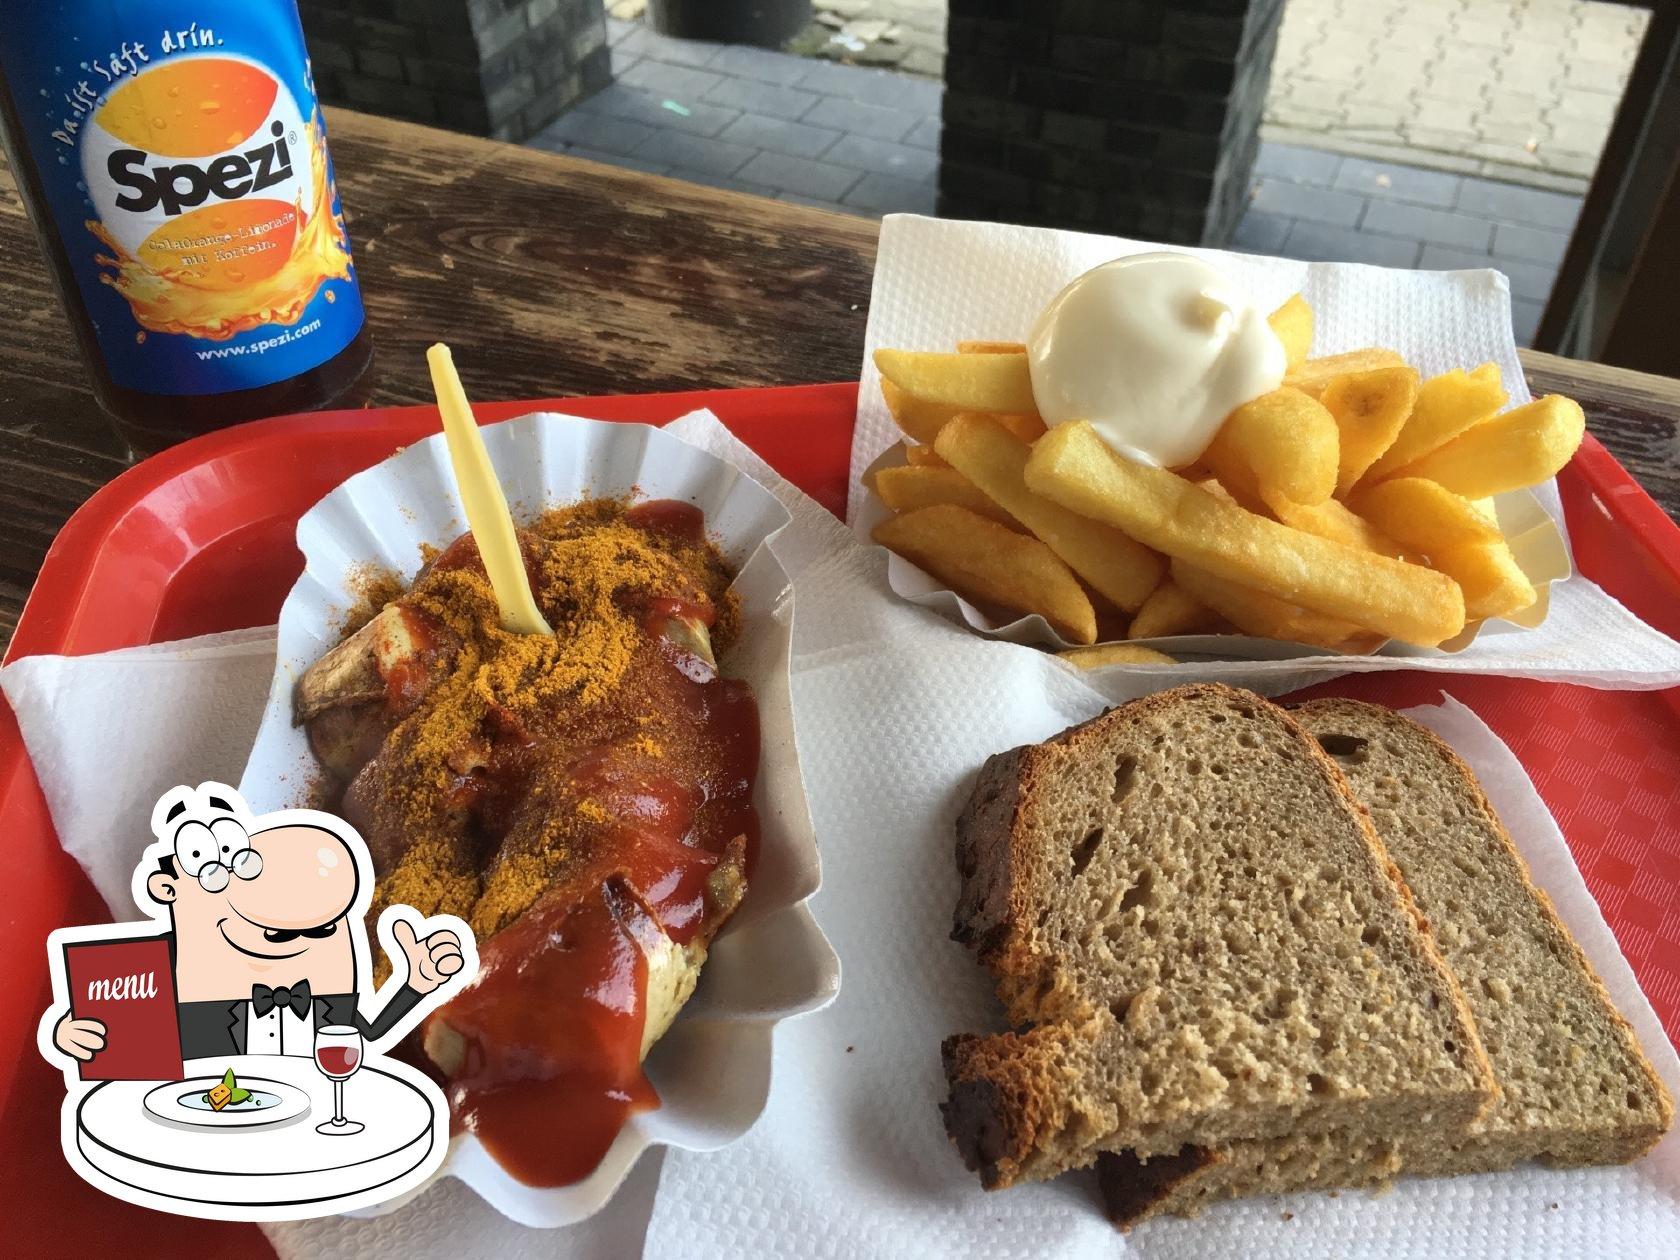 Meals at Best Worscht in Town